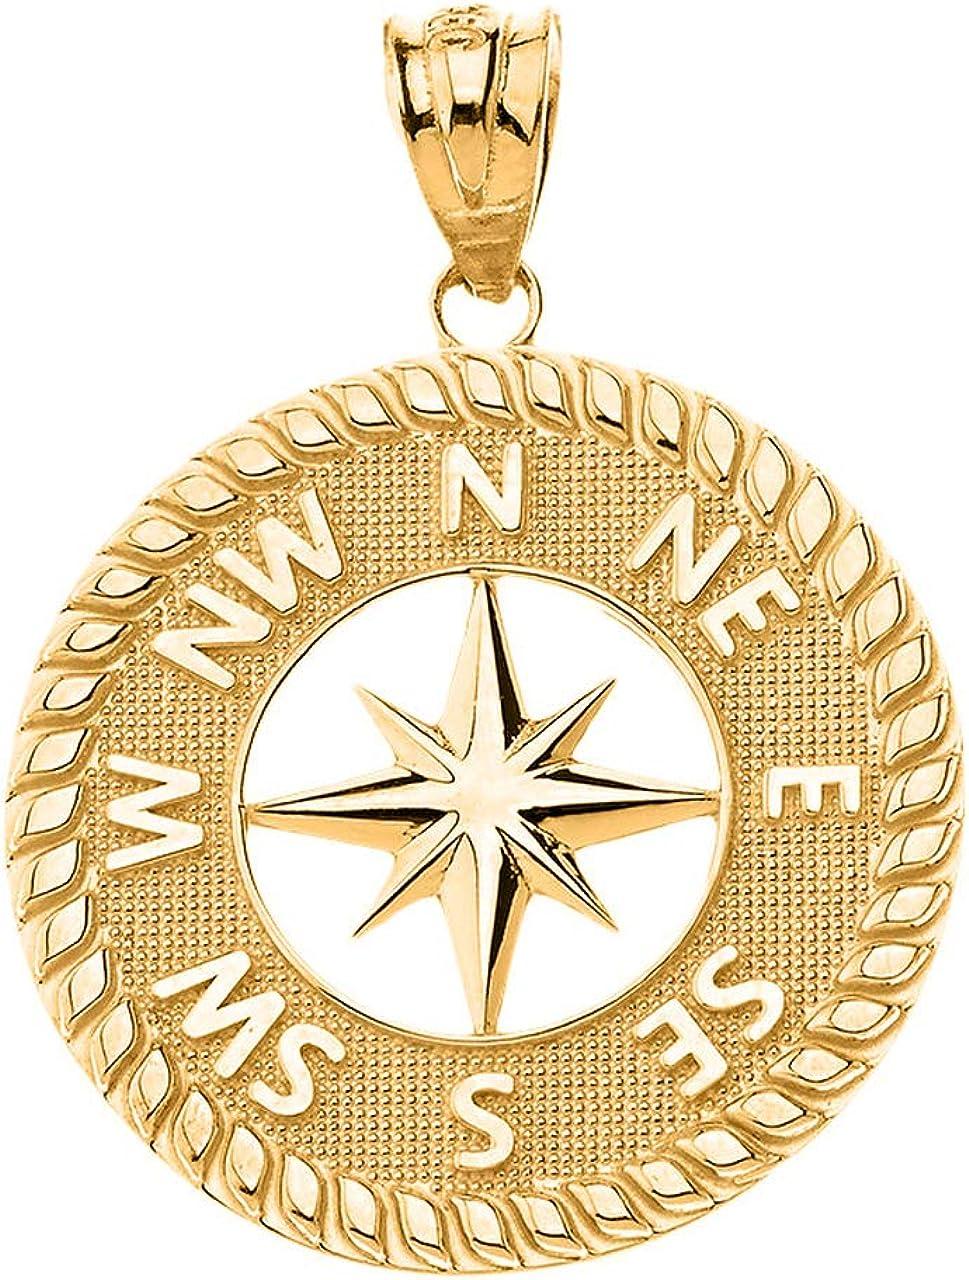 Certified 14k Gold Nautical Navigation Compass North Star Starburst Pendant